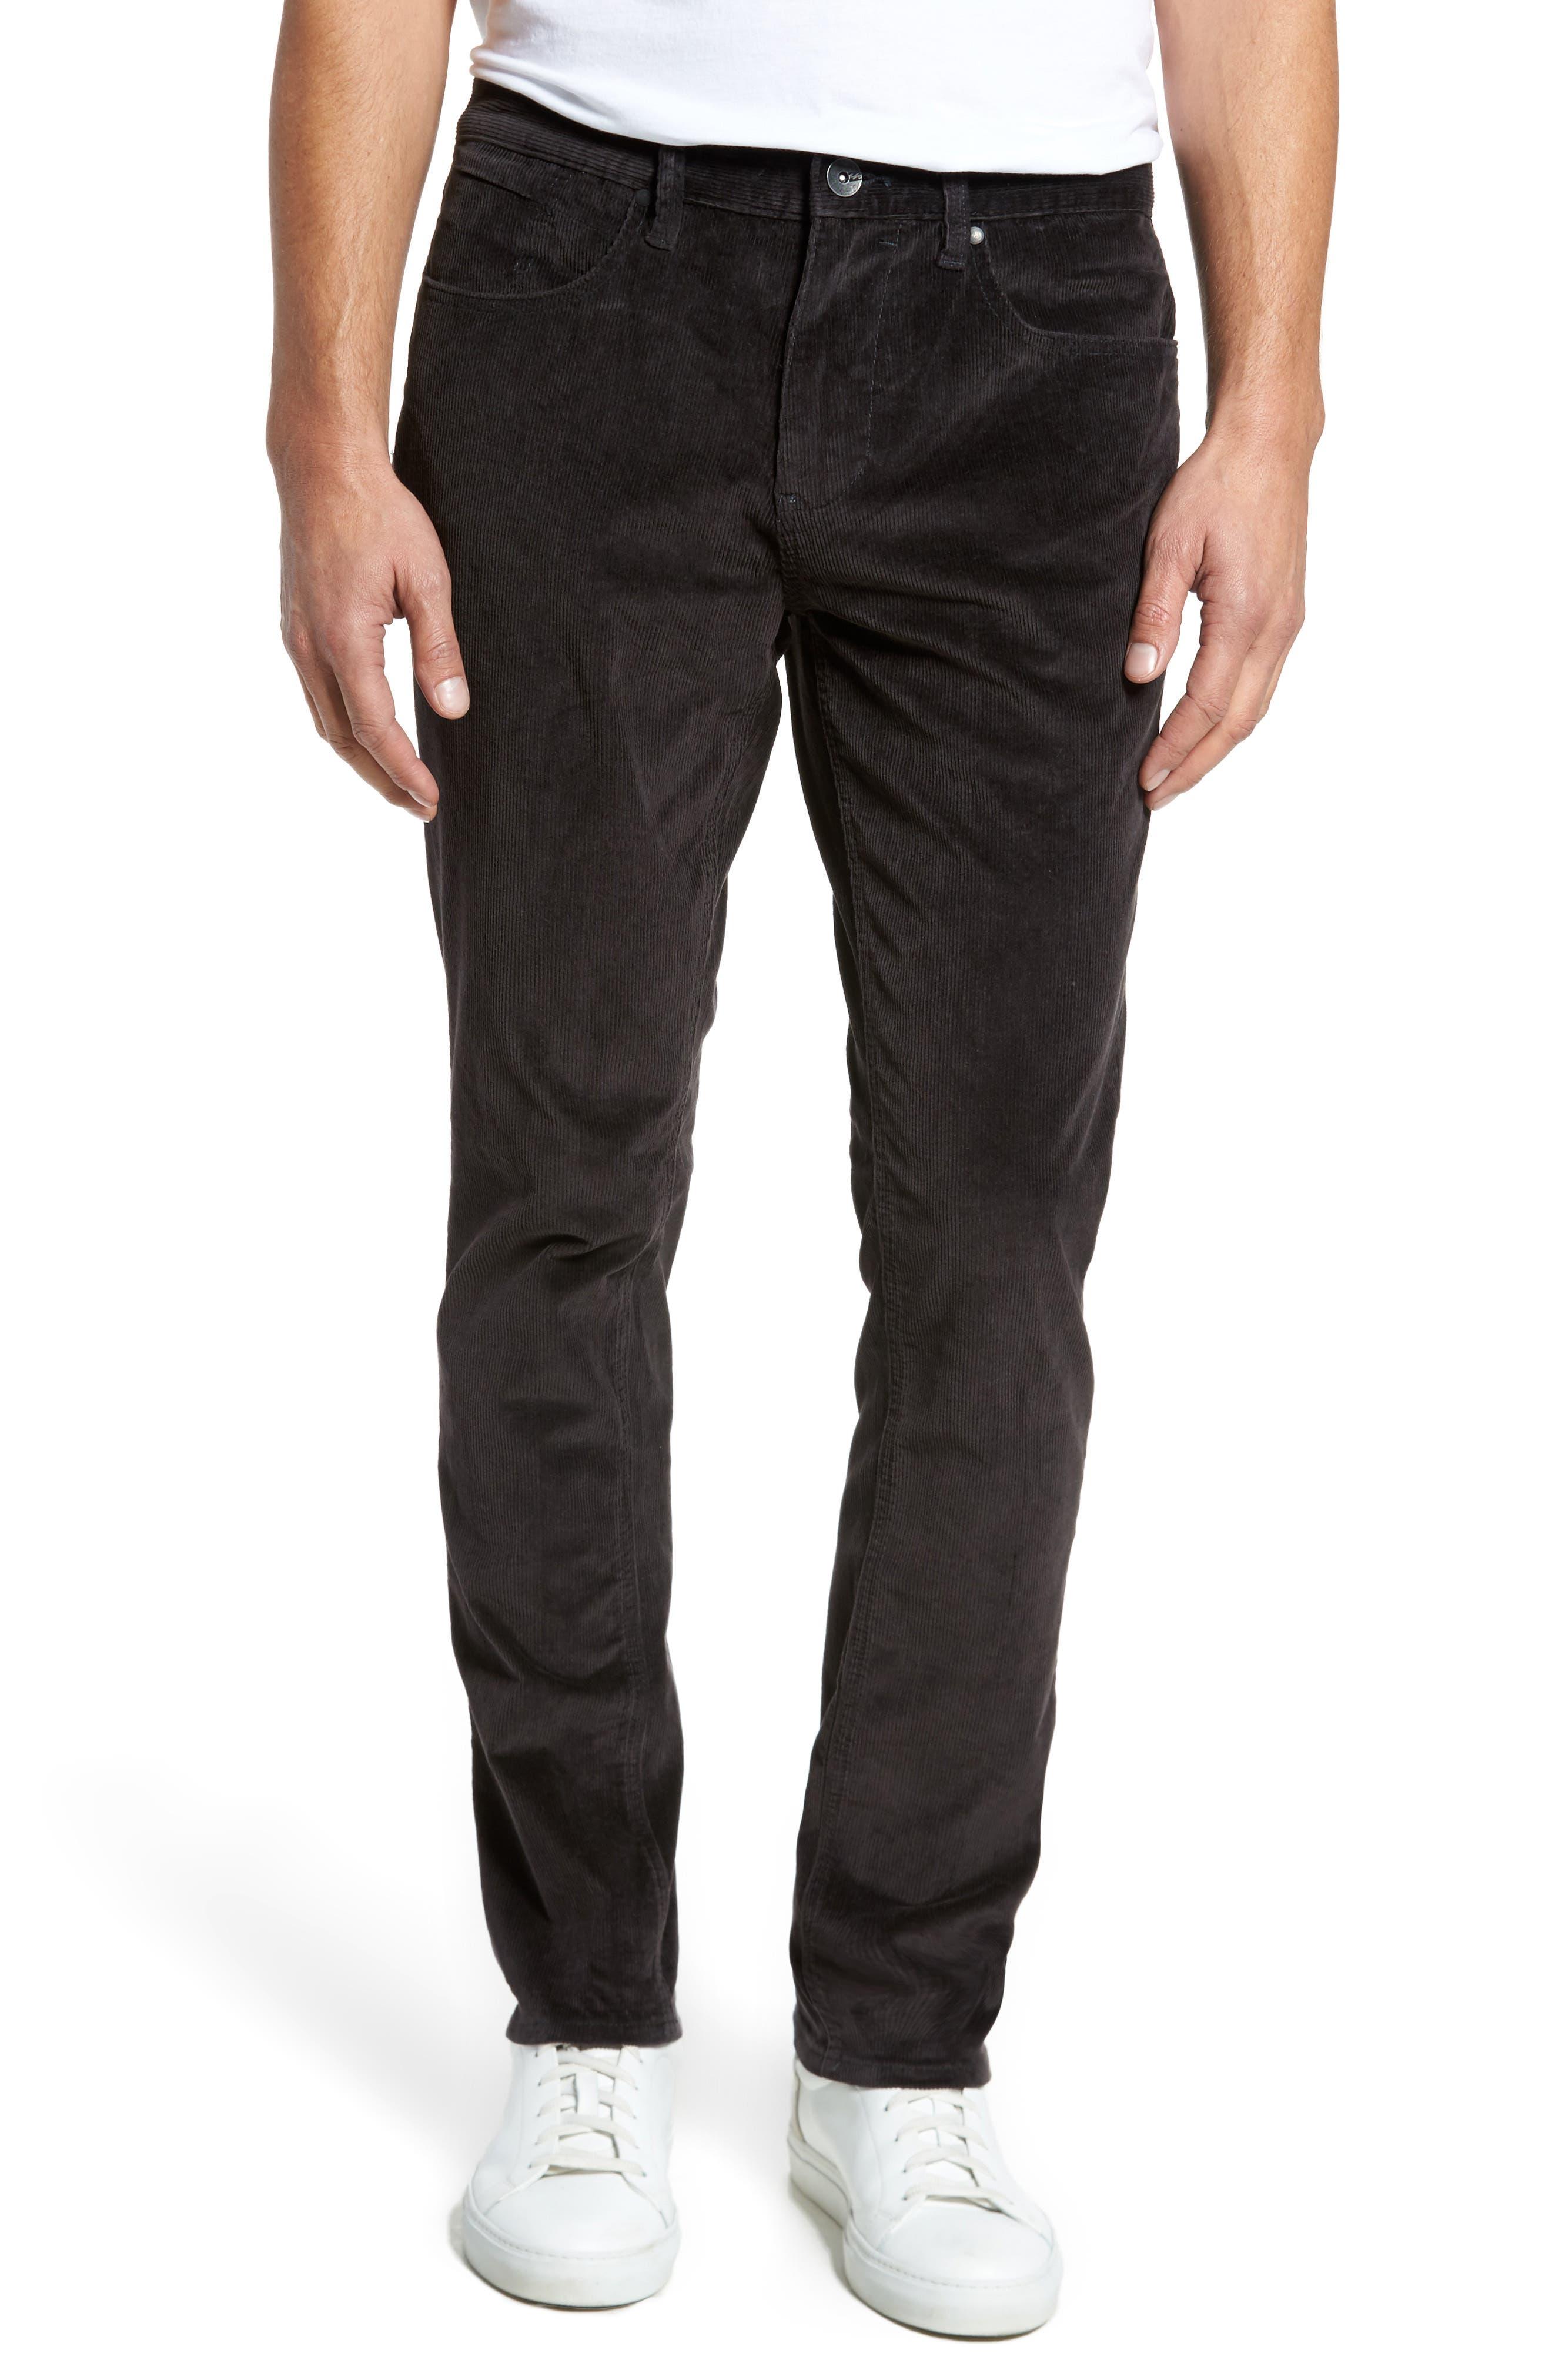 Outsider Corduroy Pants,                         Main,                         color, Charcoal